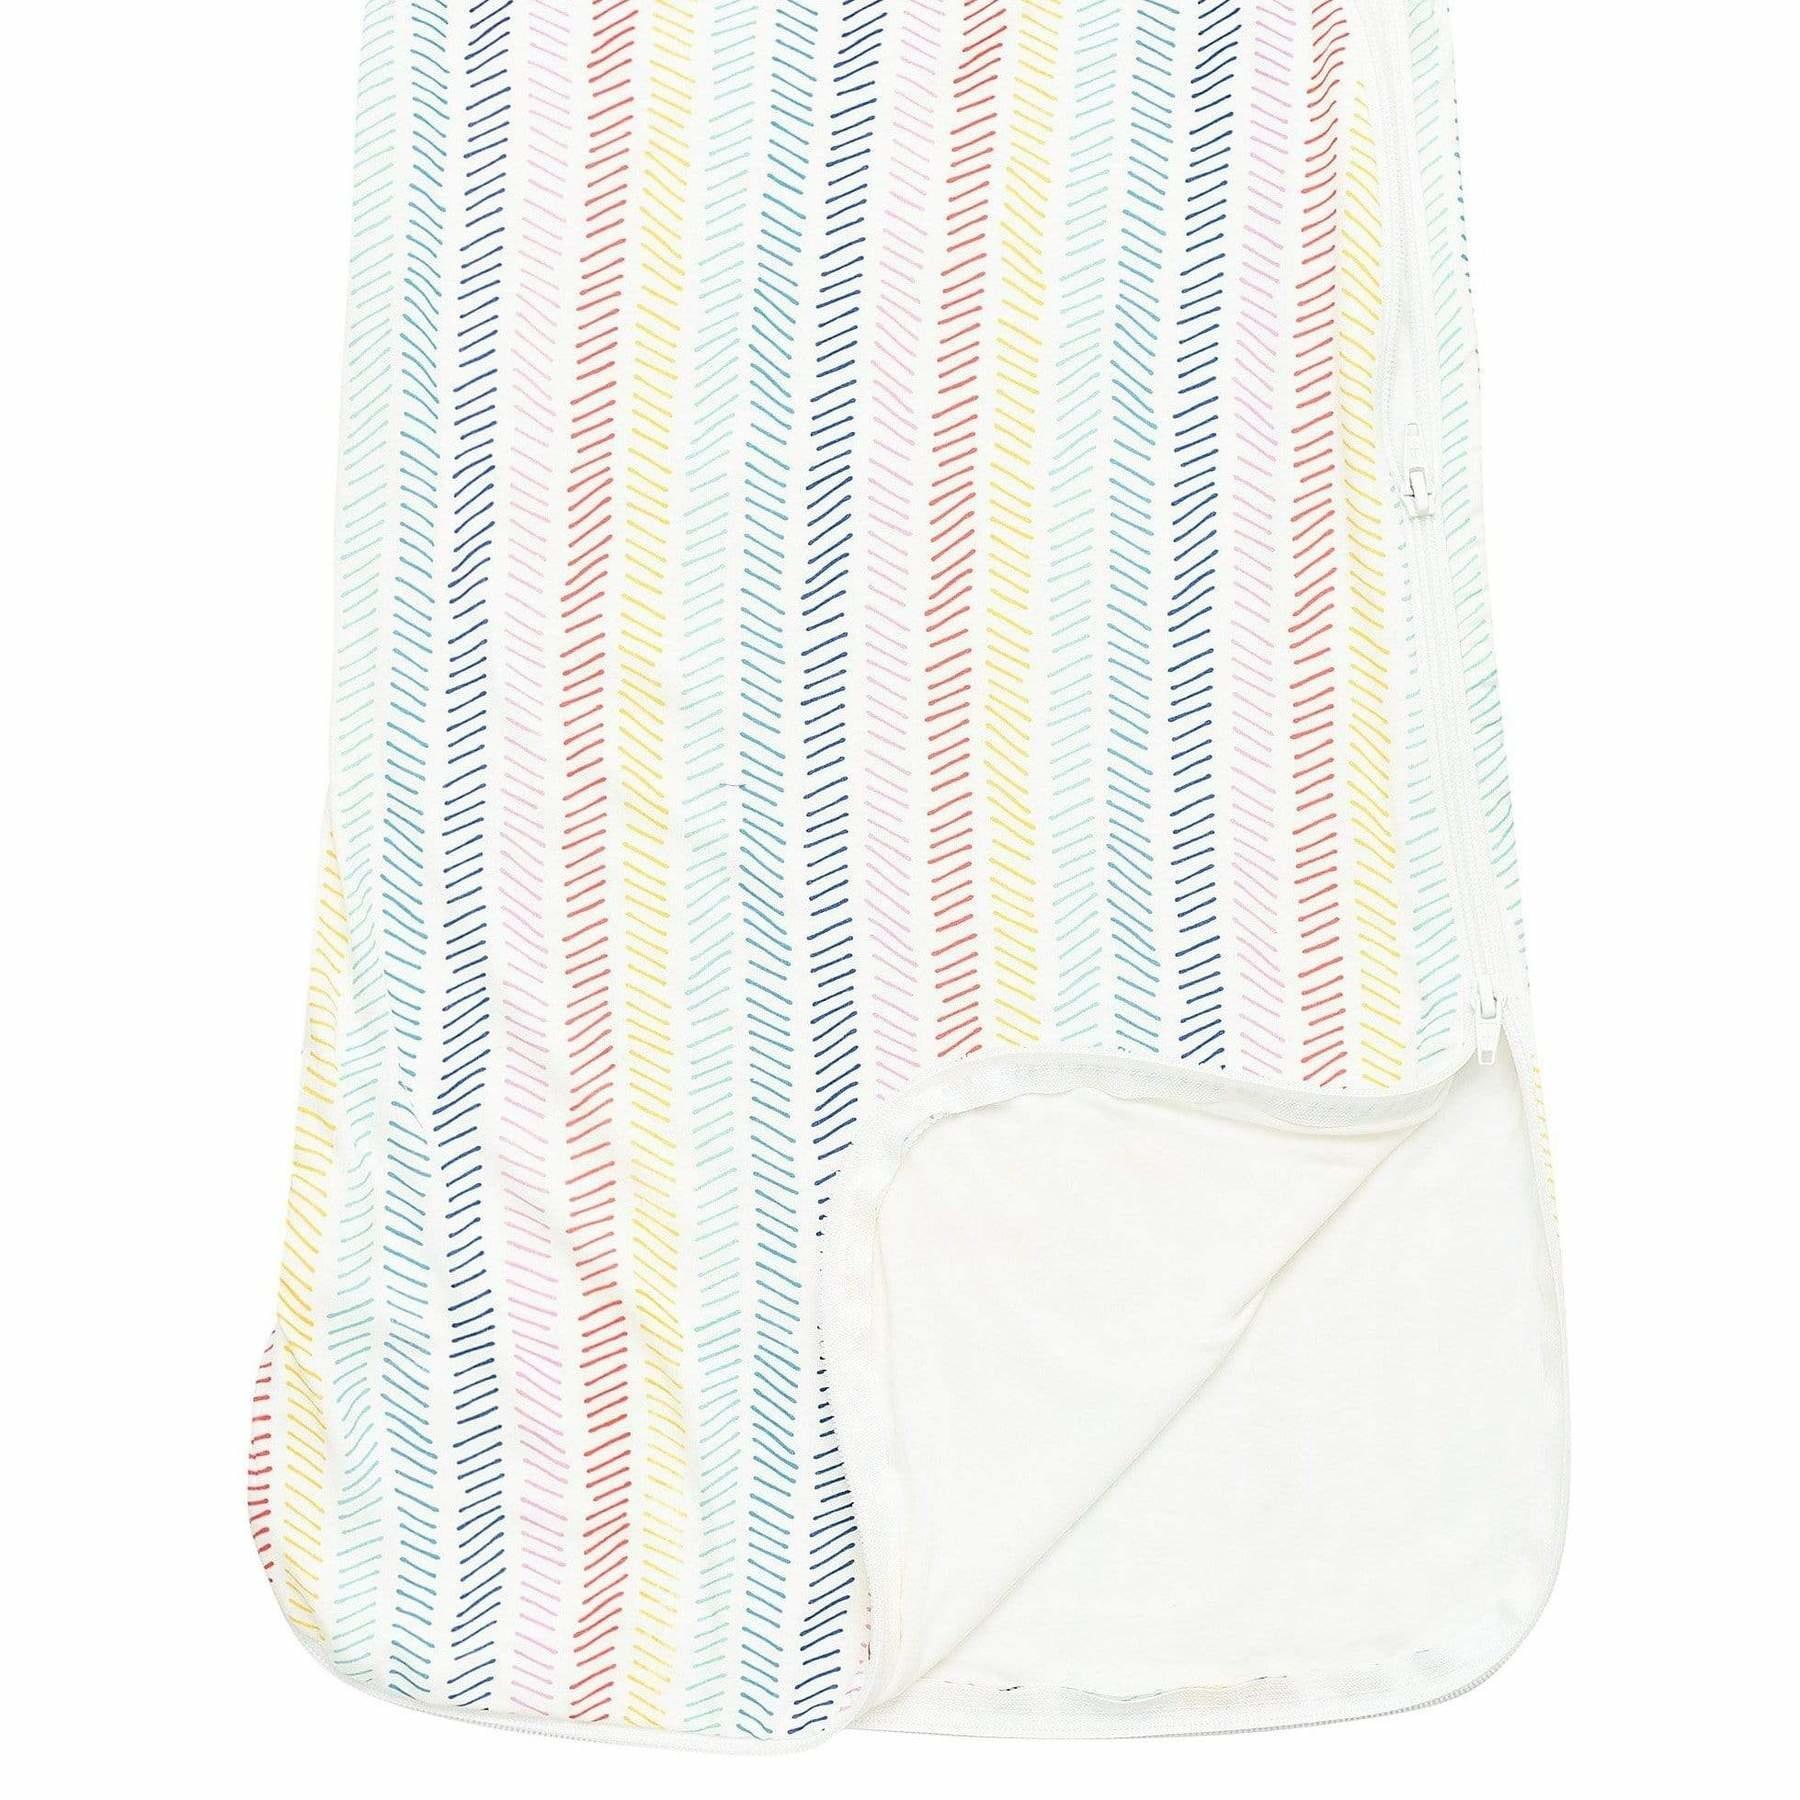 Kyte Baby Kyte Baby Bamboo Sleep Bag 0.5 TOG - Herringbone